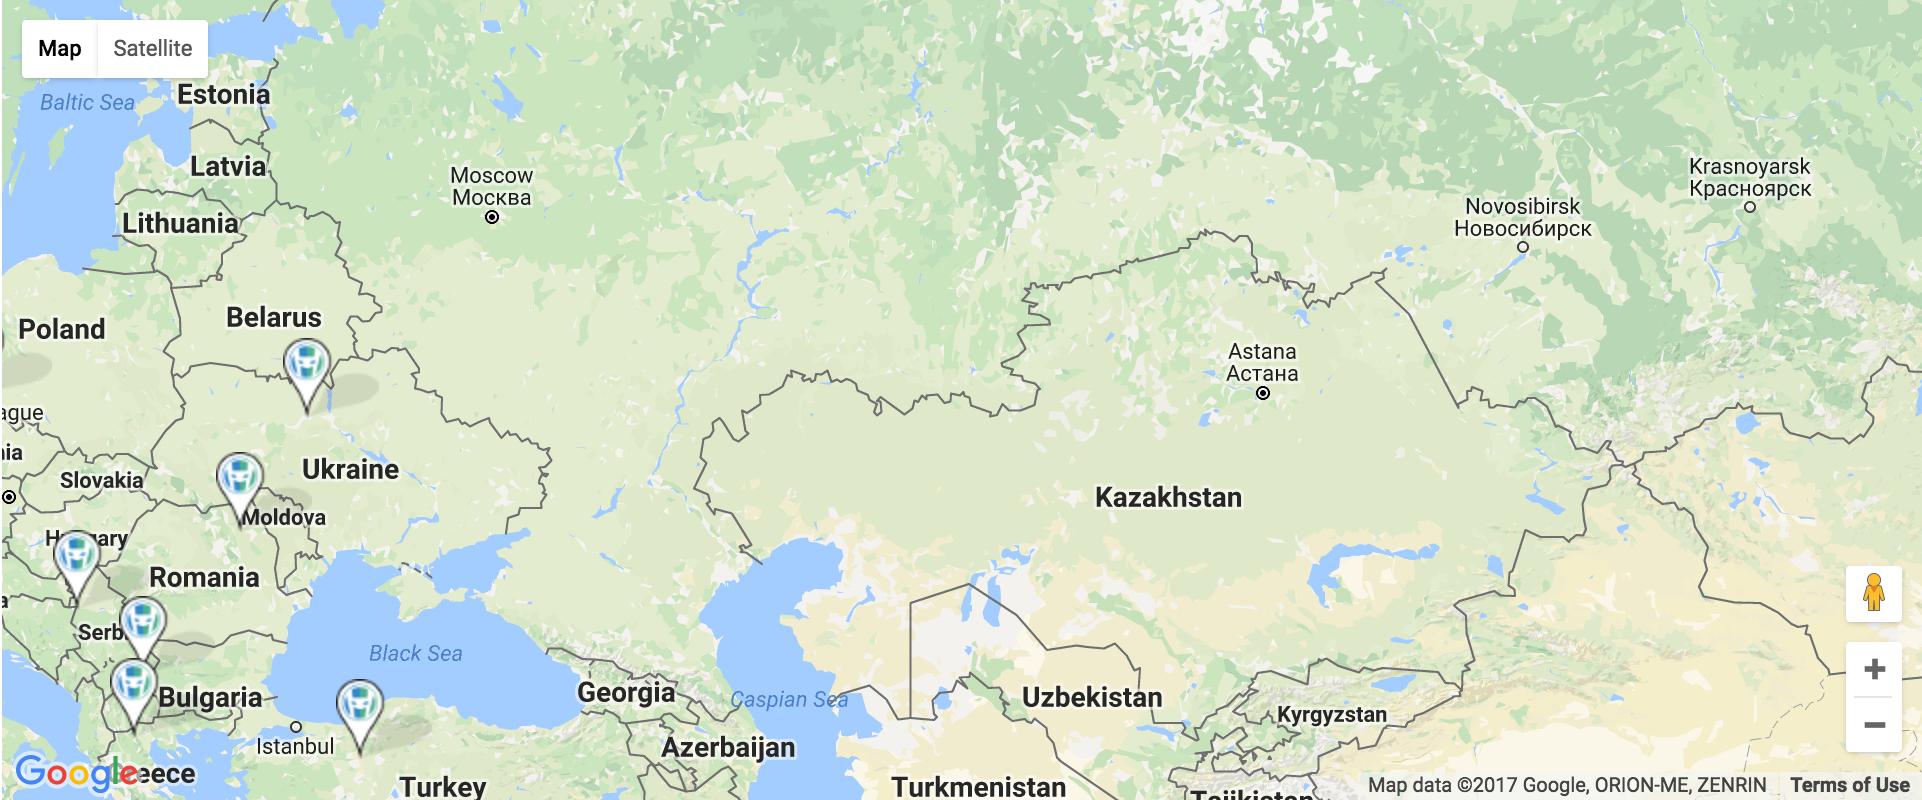 HeroPress Geography: Eastern Europe